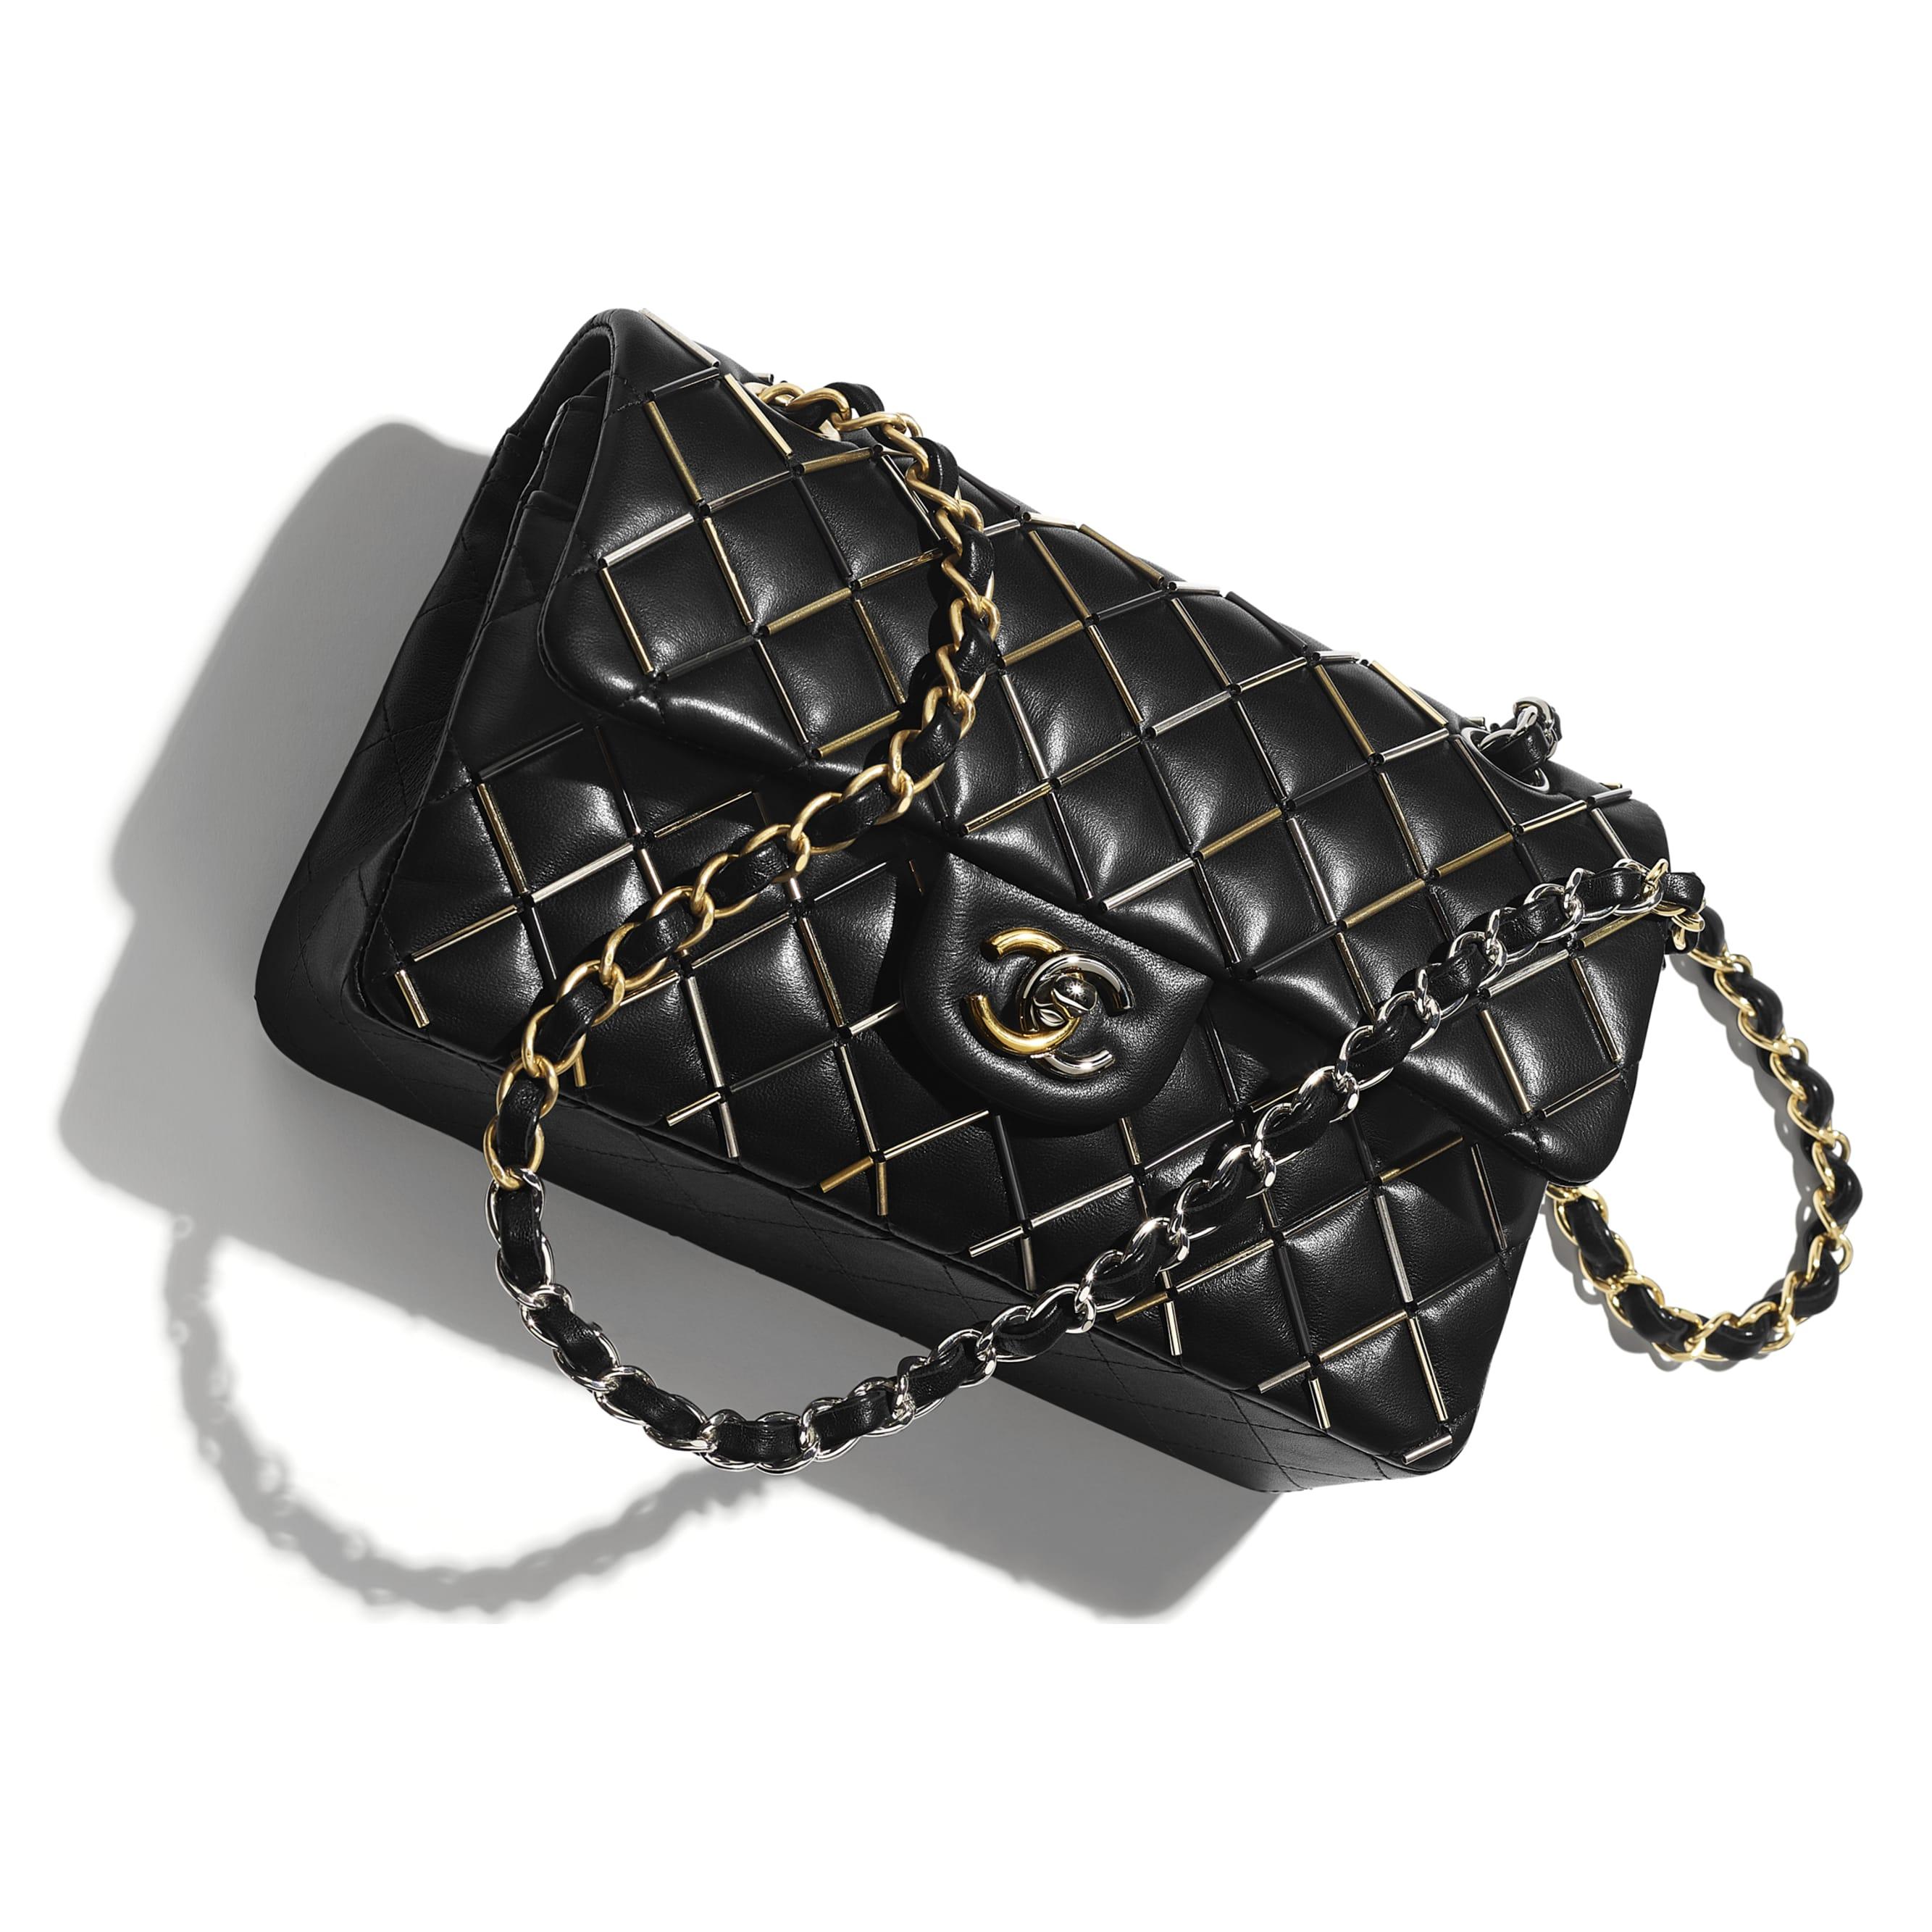 Classic Handbag - Black - Lambskin, Gold-Tone, Silver-Tone, Black & Ruthenium-Finish Metal - CHANEL - Extra view - see standard sized version